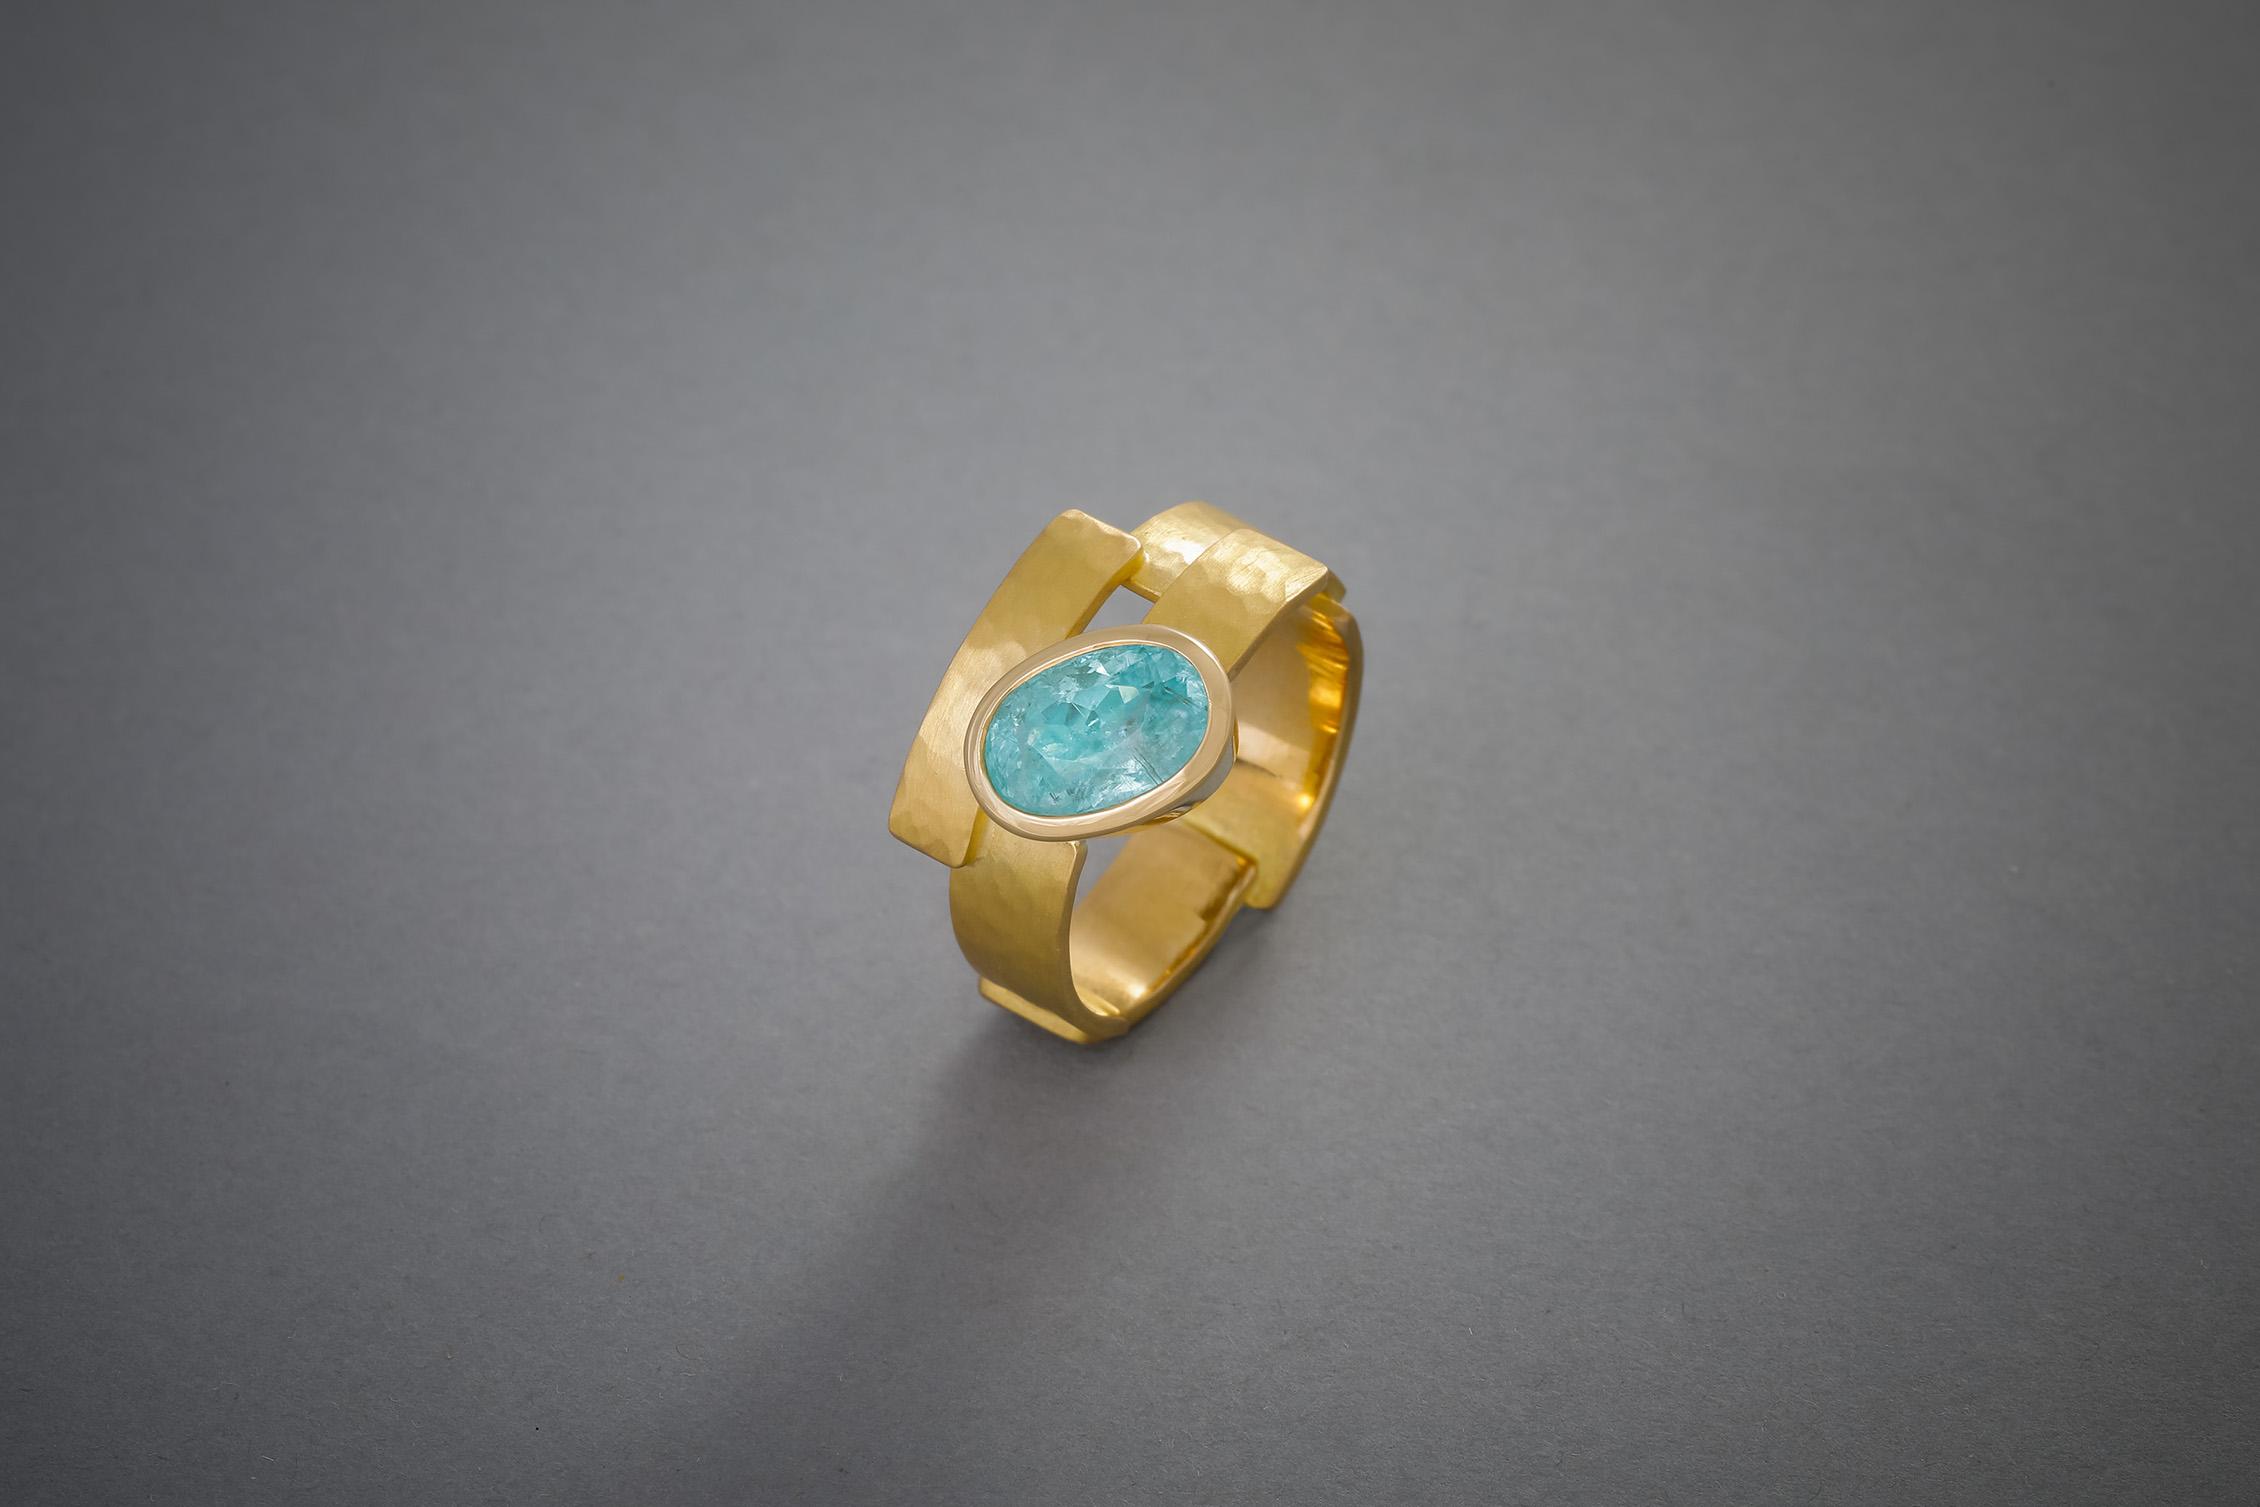 057 21kt Goldring, Paraiba Turmalin, Preis auf Anfrage